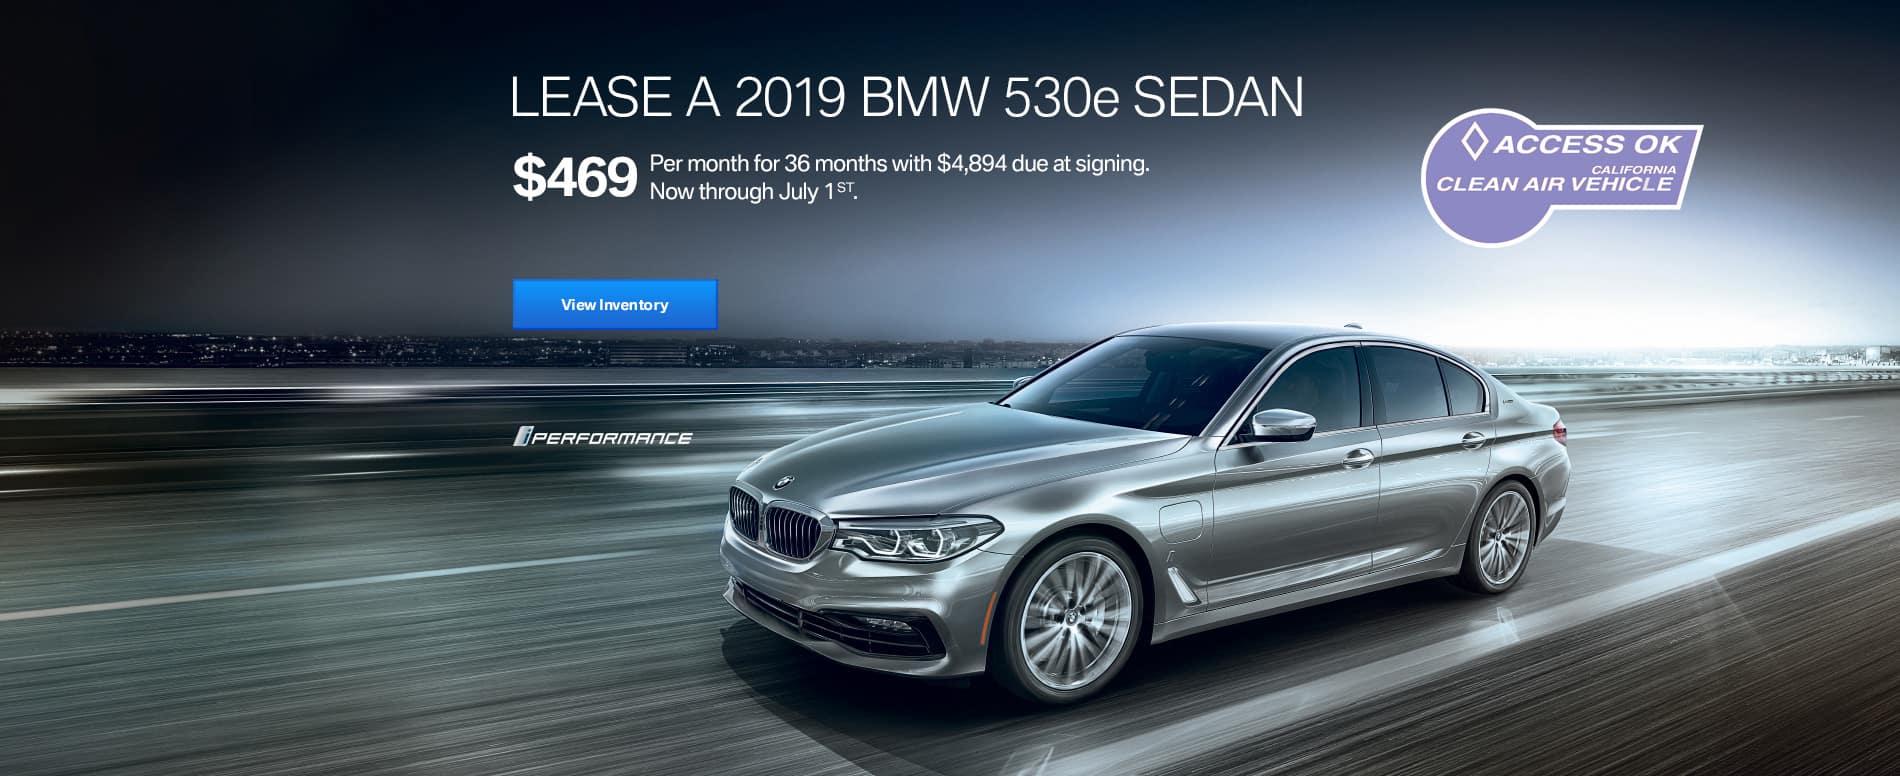 lease_a_2019_bmw_530e_$469_per_month